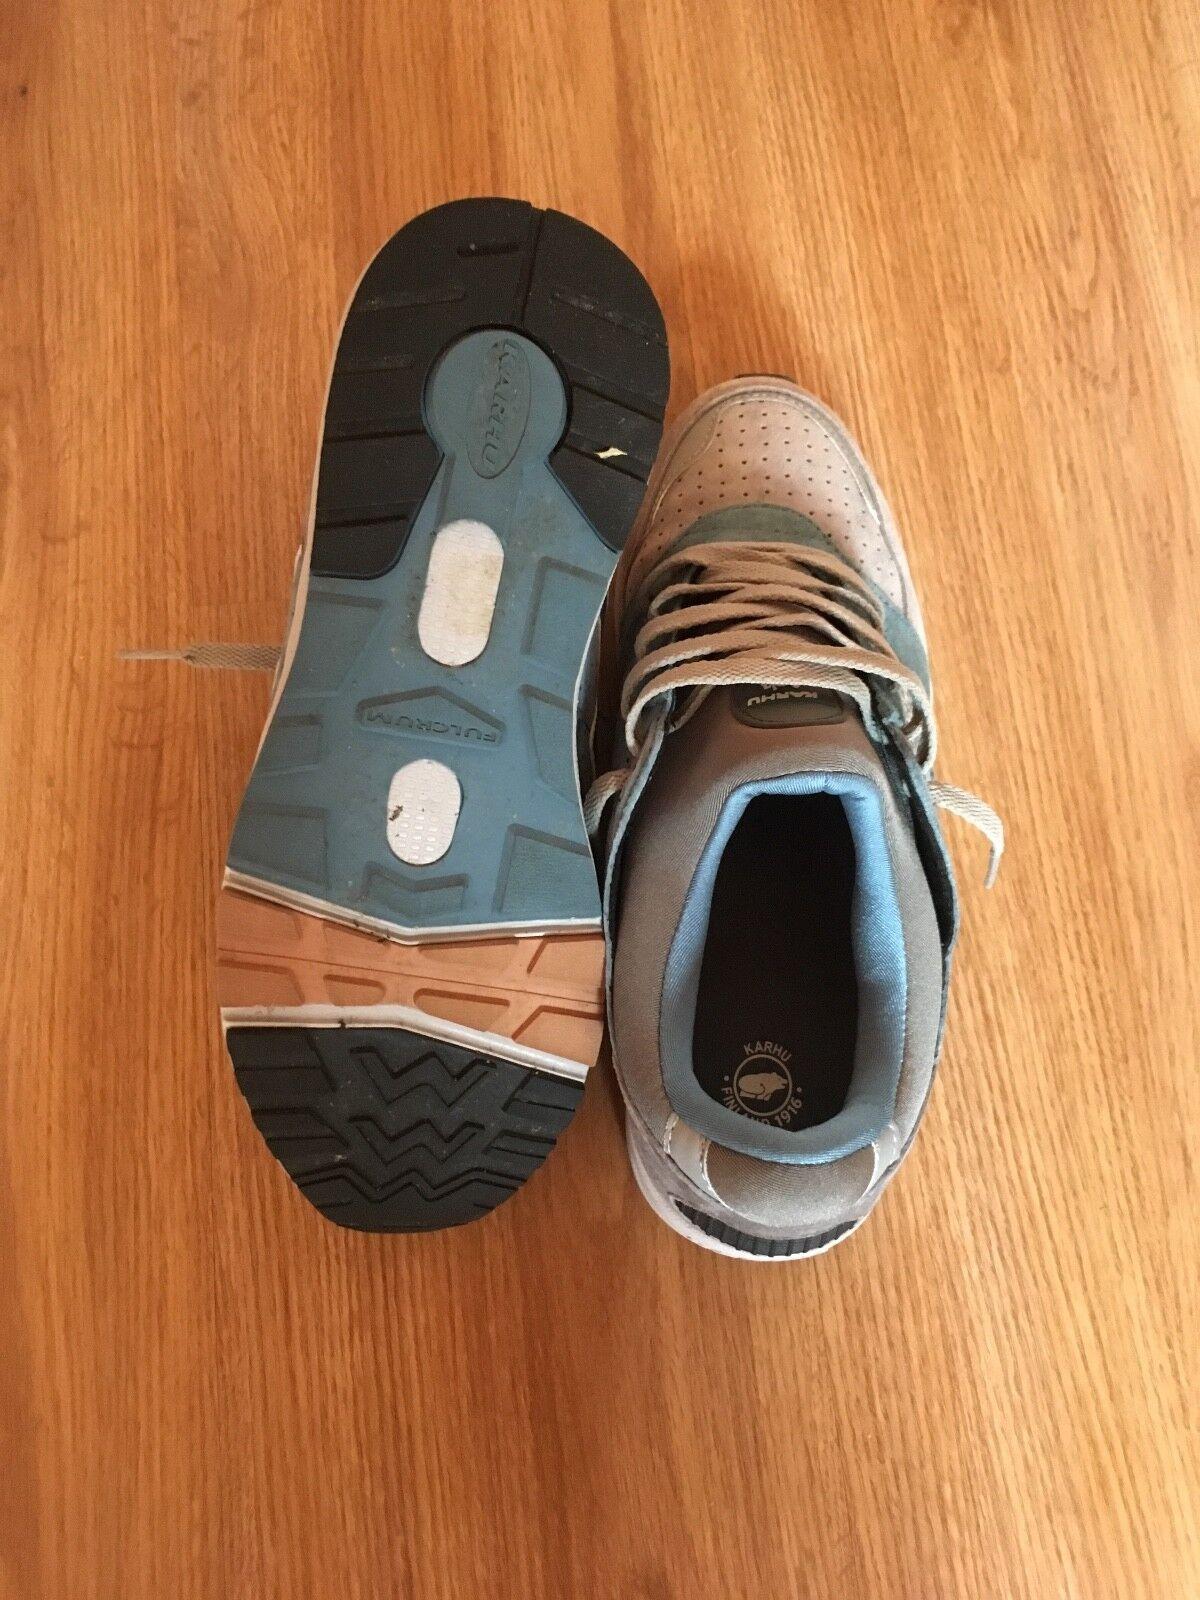 KARHU ARIA GREY/AEGEN Blau FINISH RUNNING BRAND LIMITED EDITION SNEAKER SNEAKER SNEAKER 9cf0a5